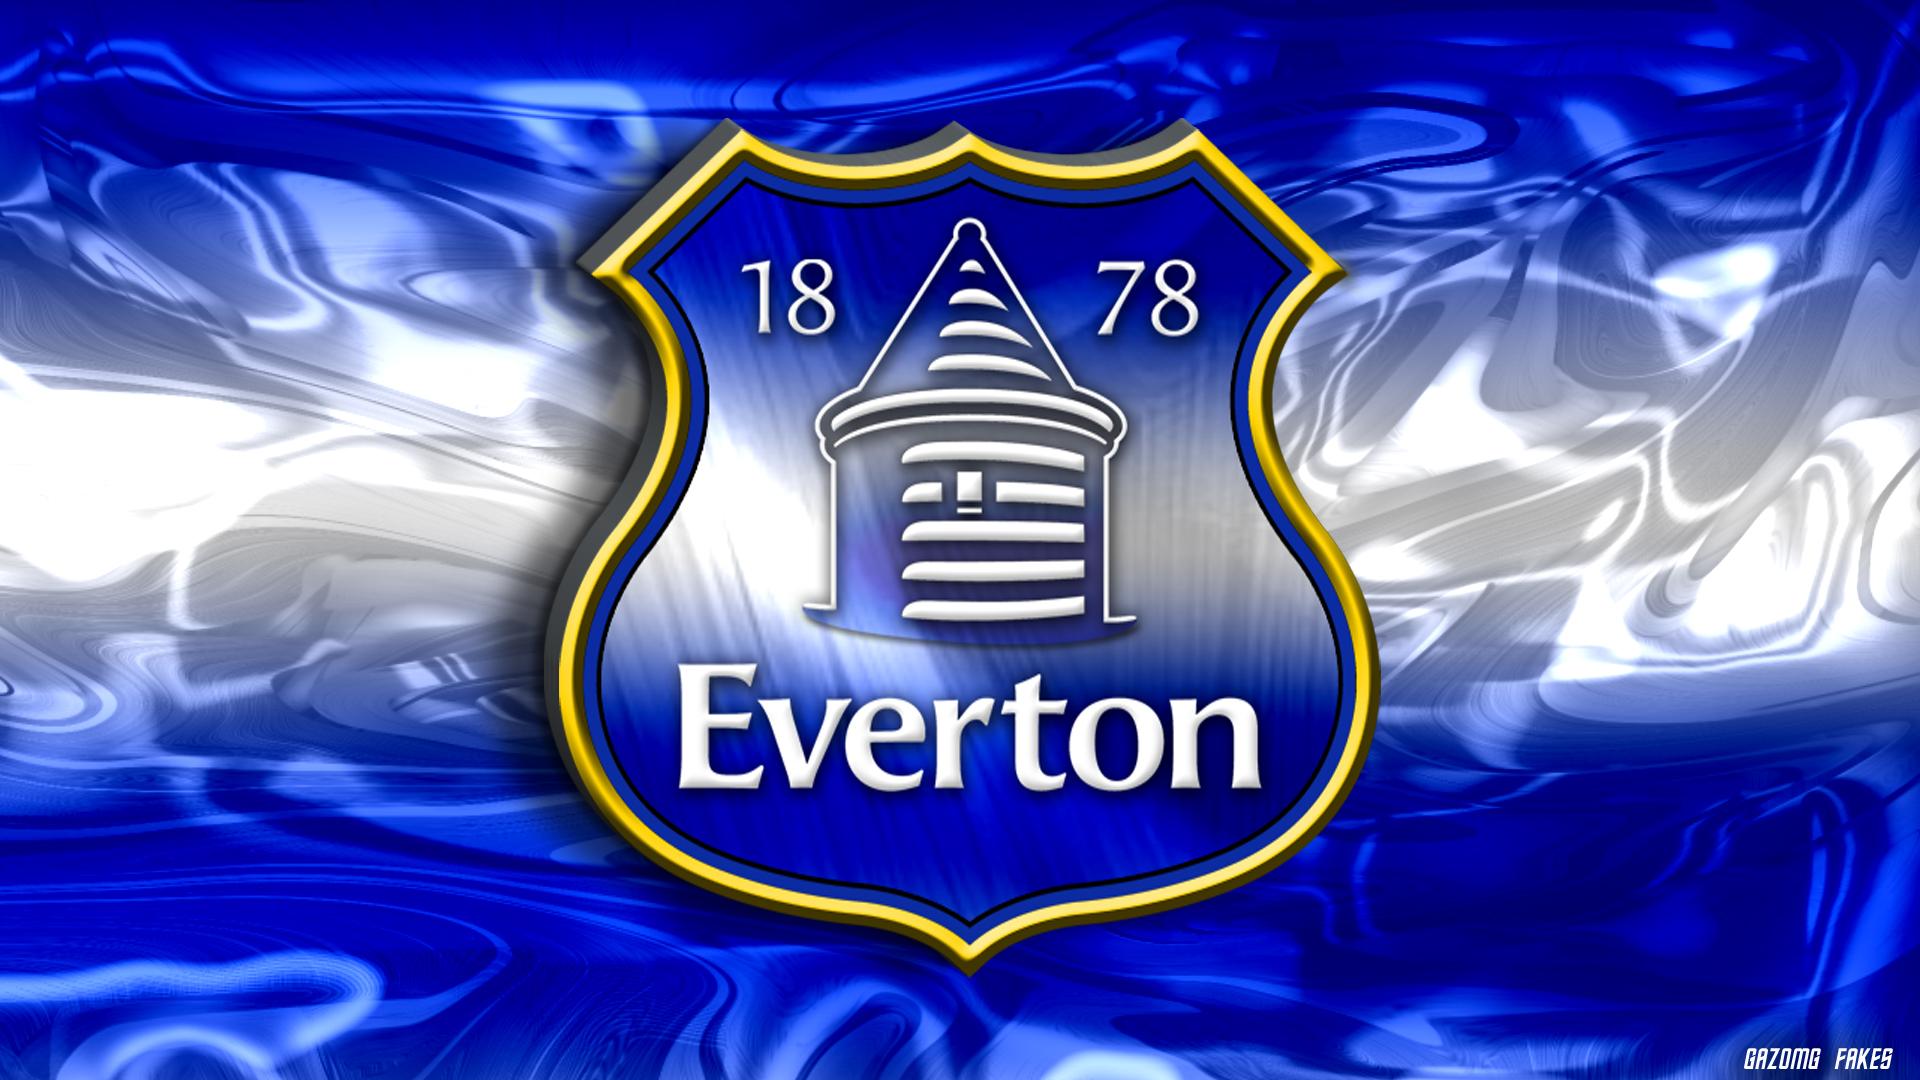 Arsenal Iphone Wallpaper Hd Everton Backgrounds Download Free Pixelstalk Net